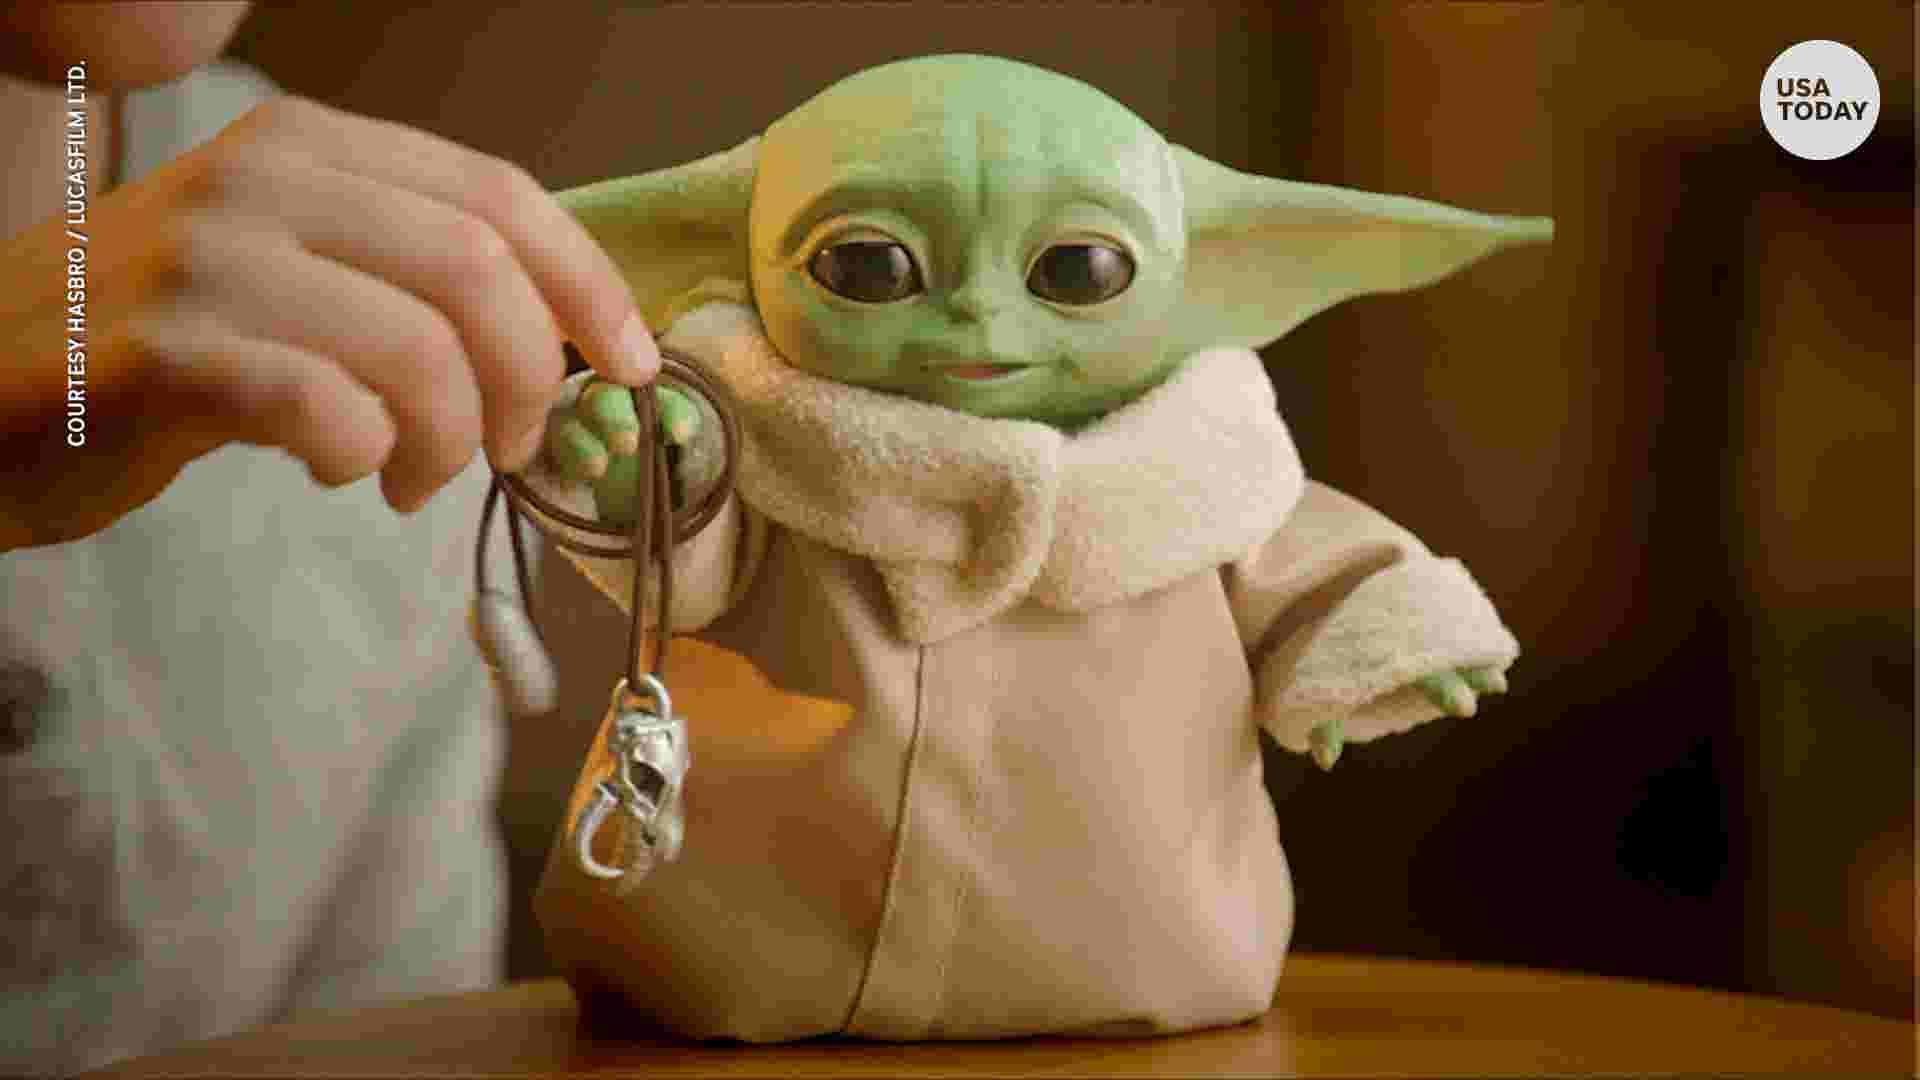 Adorable Baby Yoda toys are coming in animatronic, game, Lego, Build-a-Bear forms